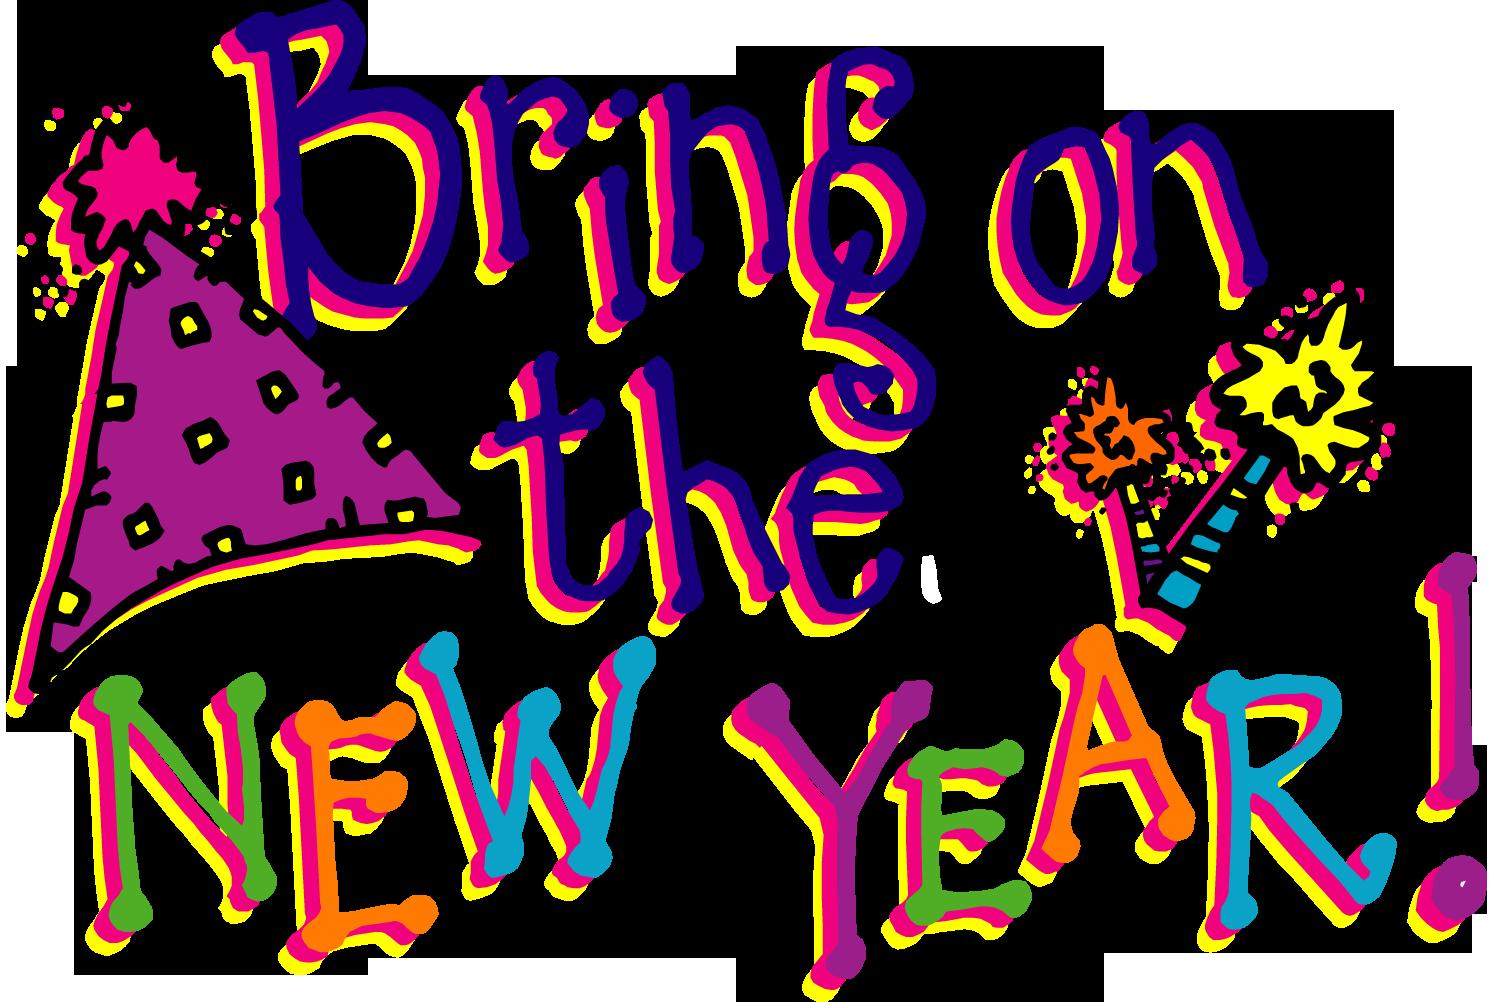 Happy New Year Clipart 6 .-Happy new year clipart 6 .-3